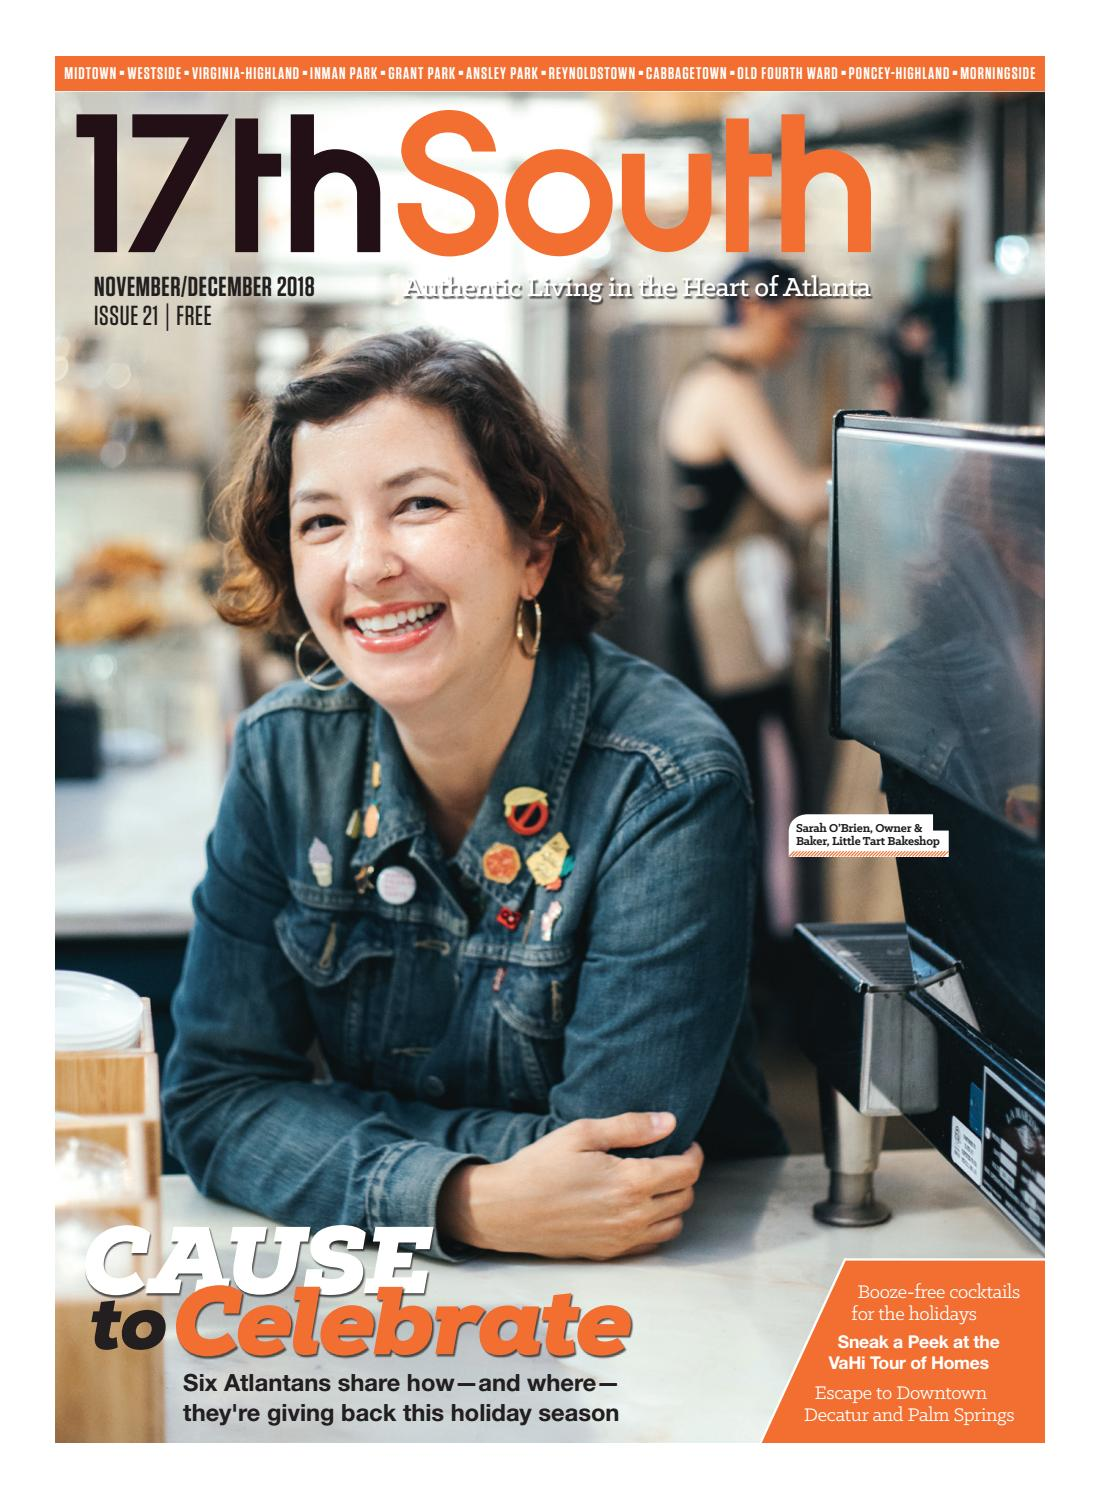 ad26a2740efc 17th South November December 2018 by 17th South Magazine - issuu